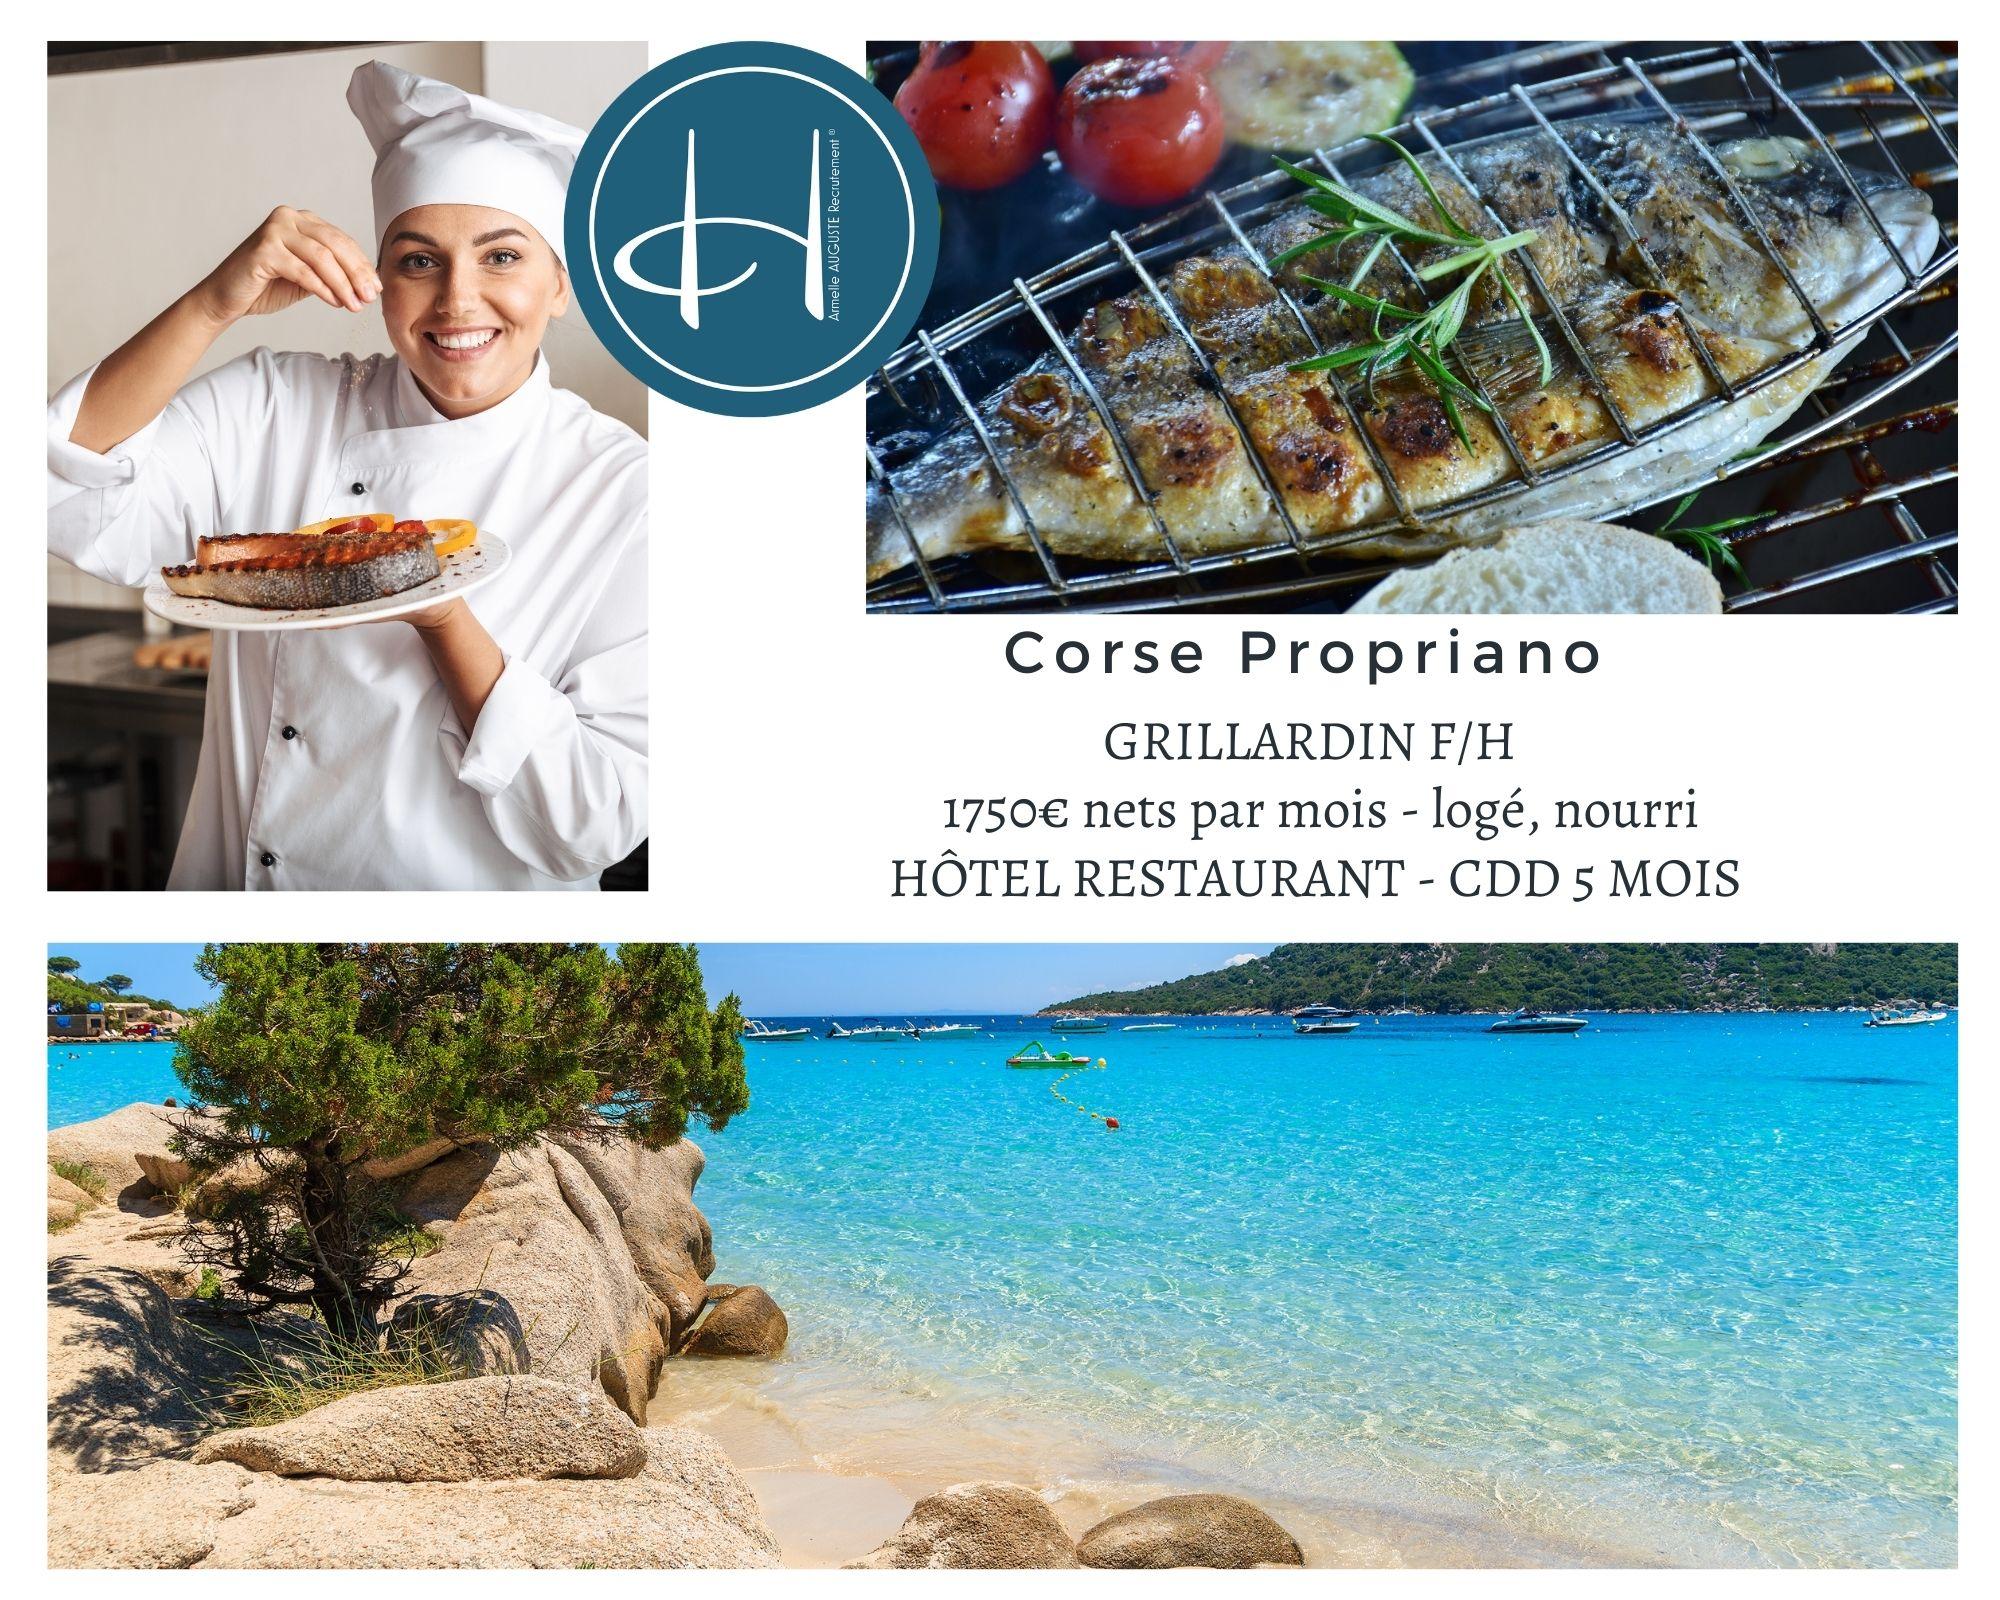 Recrutement: Grillardin en Corse Propriano saison été 2021 F/H chez Armelle AUGUSTE Recrutement® à Propriano